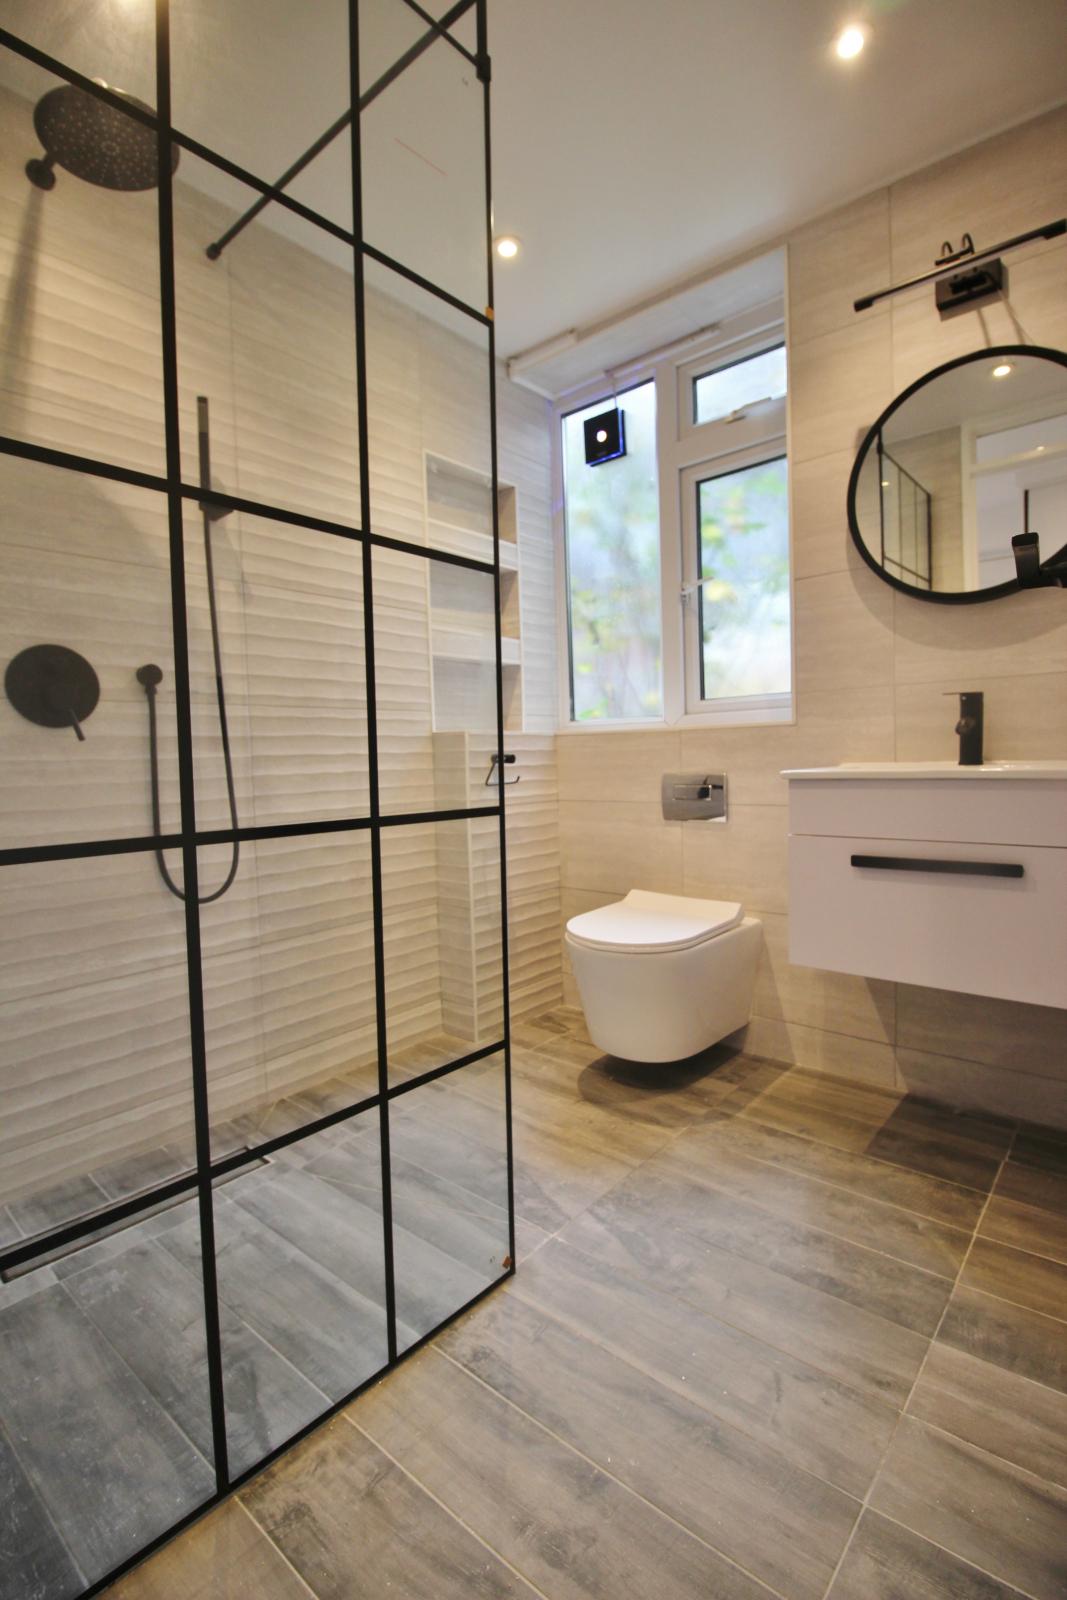 Wet Room / Shower Room